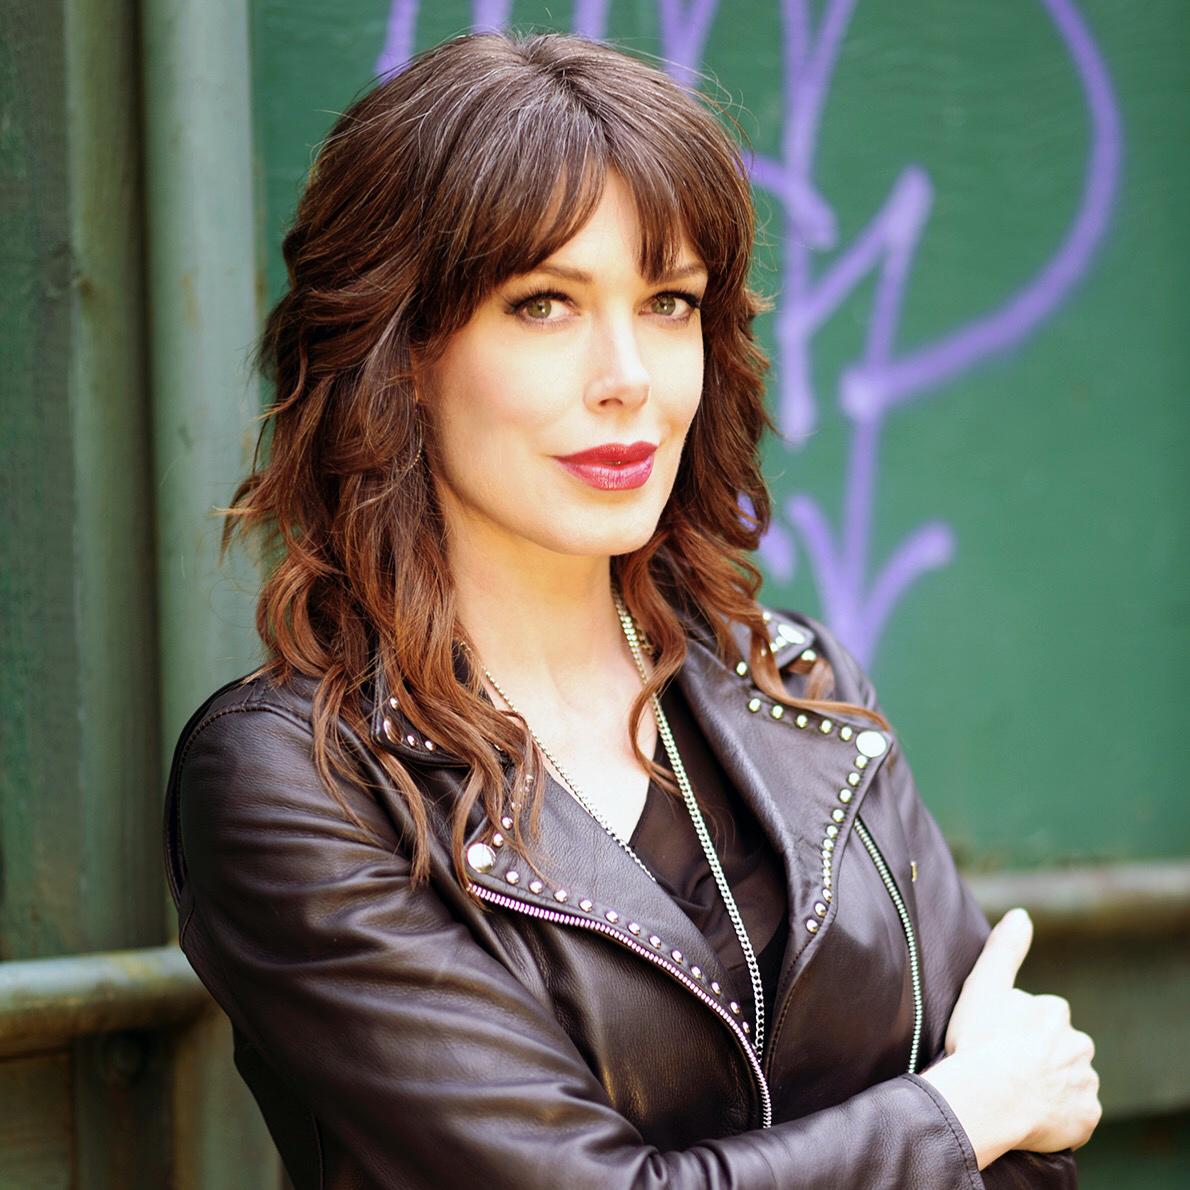 Tara Moss , author of the  Mak Vanderwall PI  series and brand new  Billie Walker  series, is headlining at Murder She Wrote © Berndt Sellheim